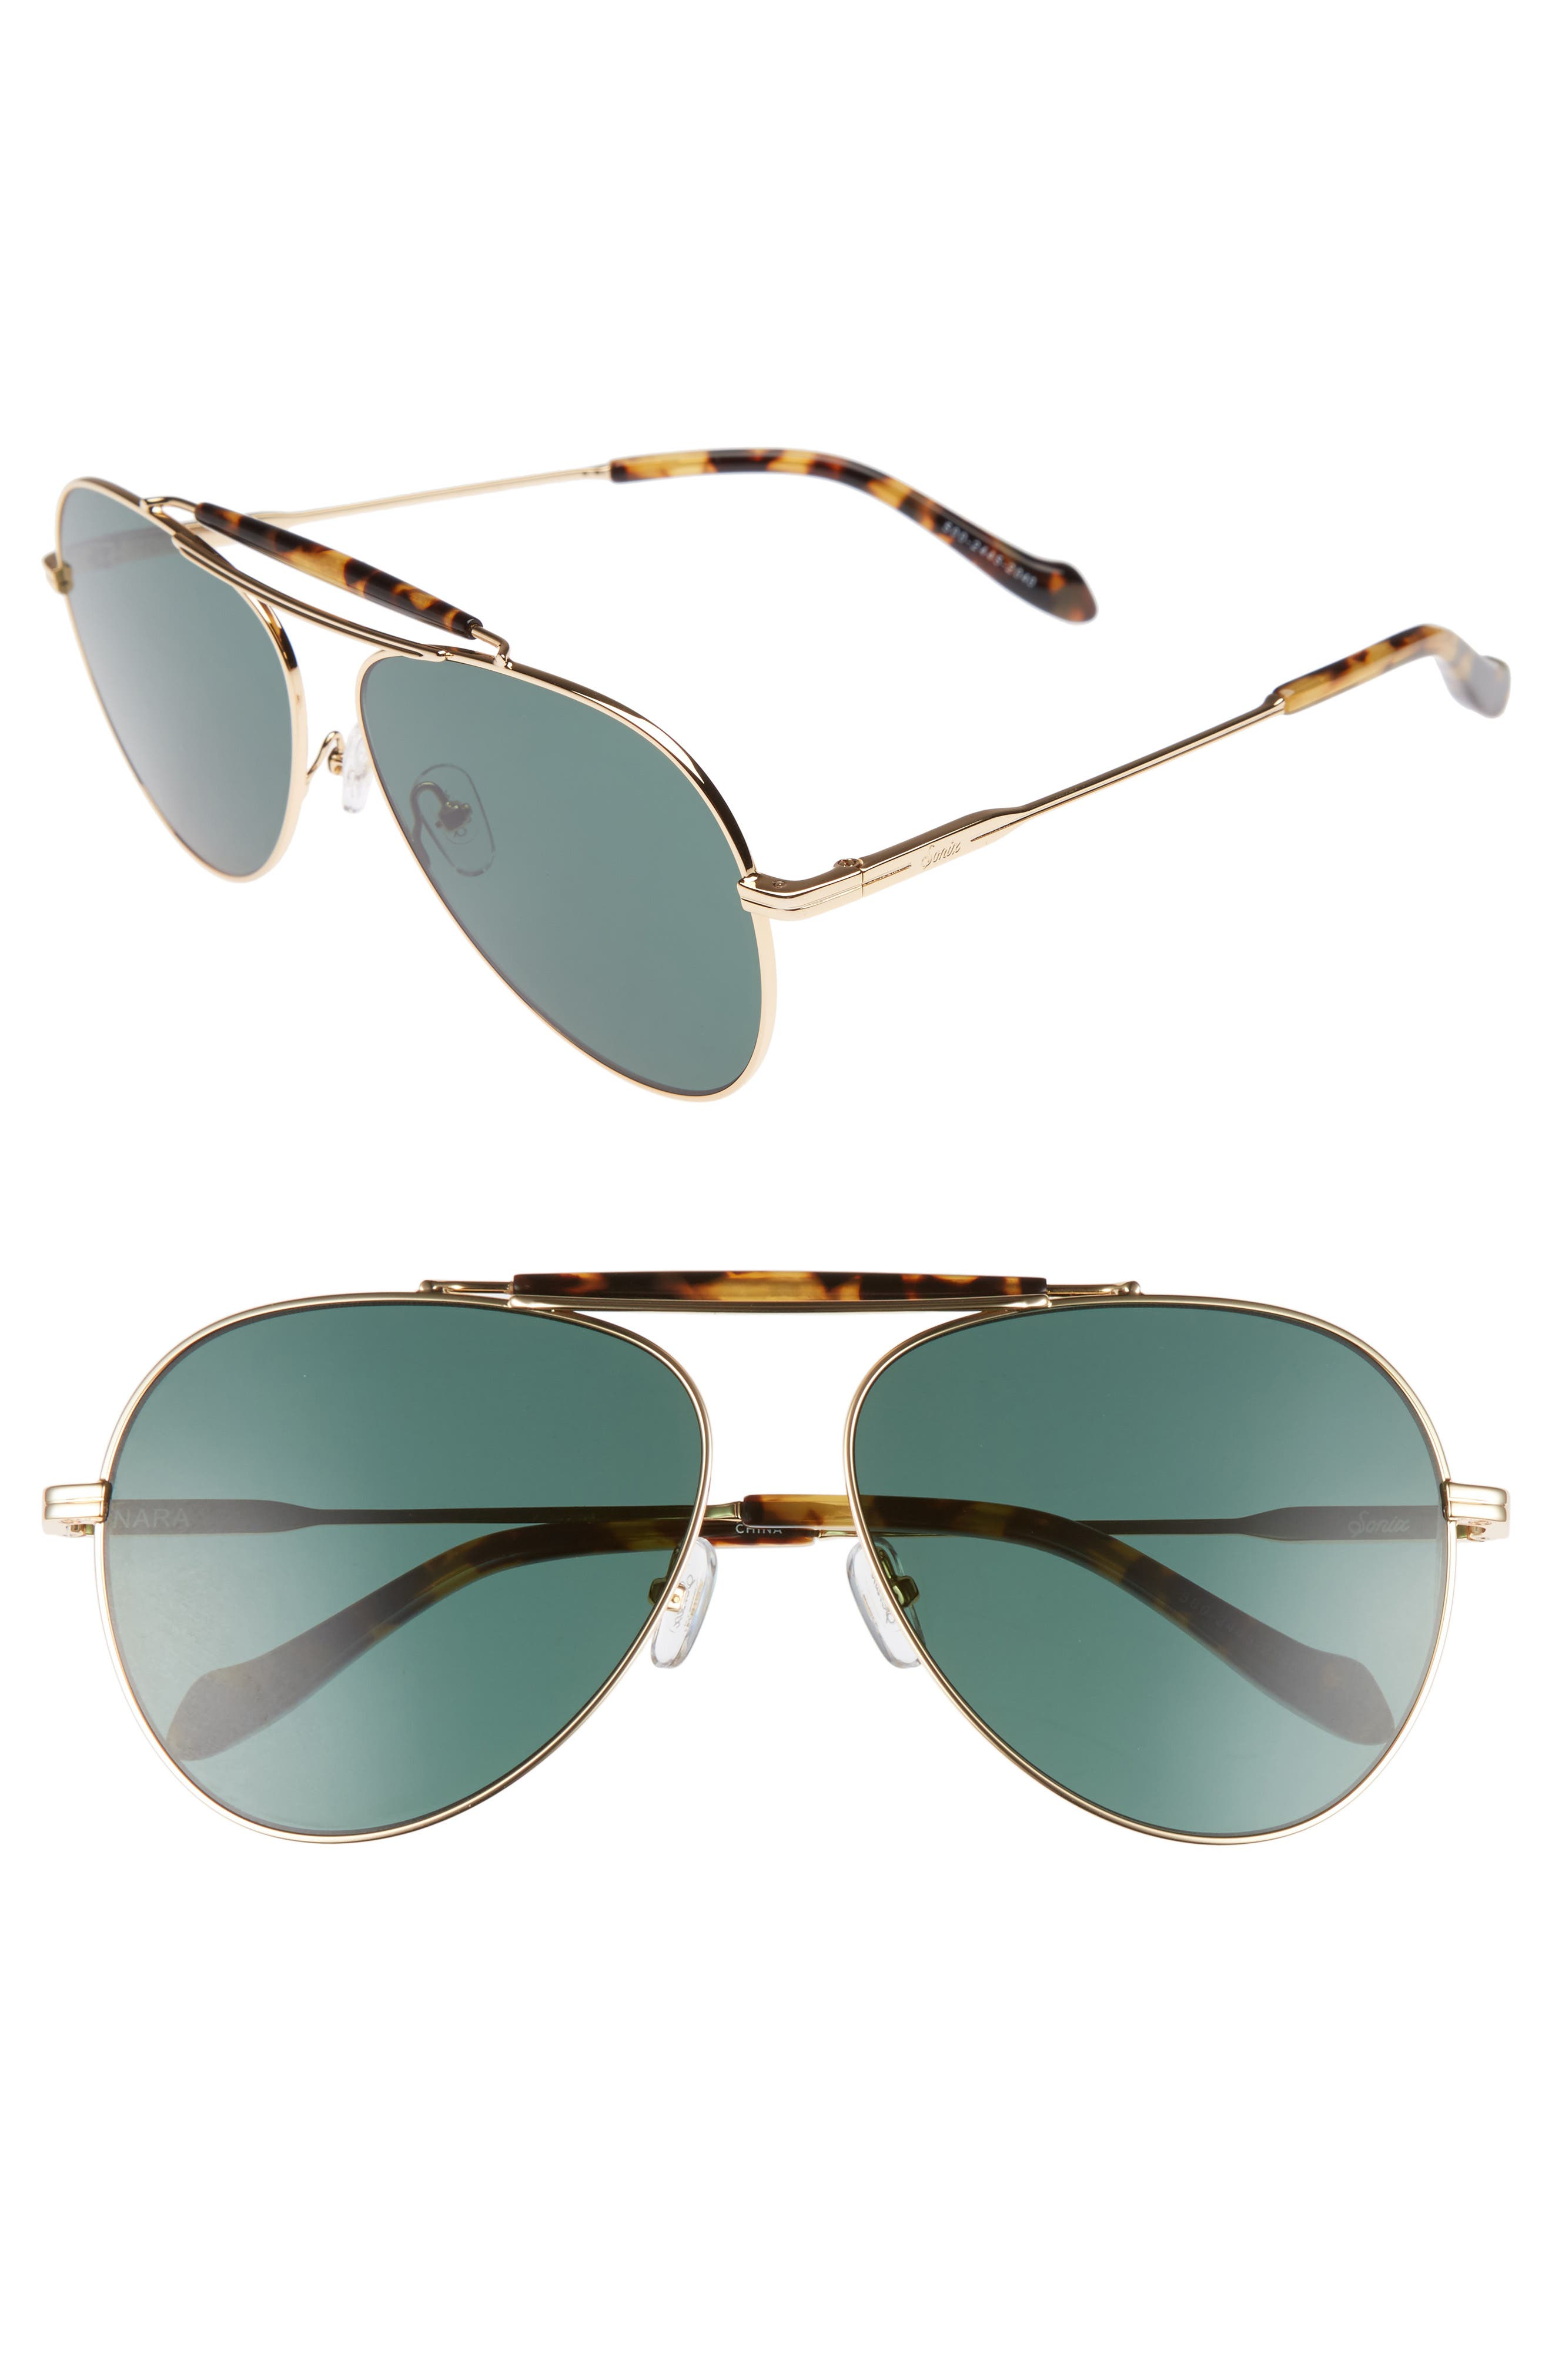 Nara 60mm Aviator Sunglasses,                             Main thumbnail 1, color,                             Brown Tortoise/ Olive Lens